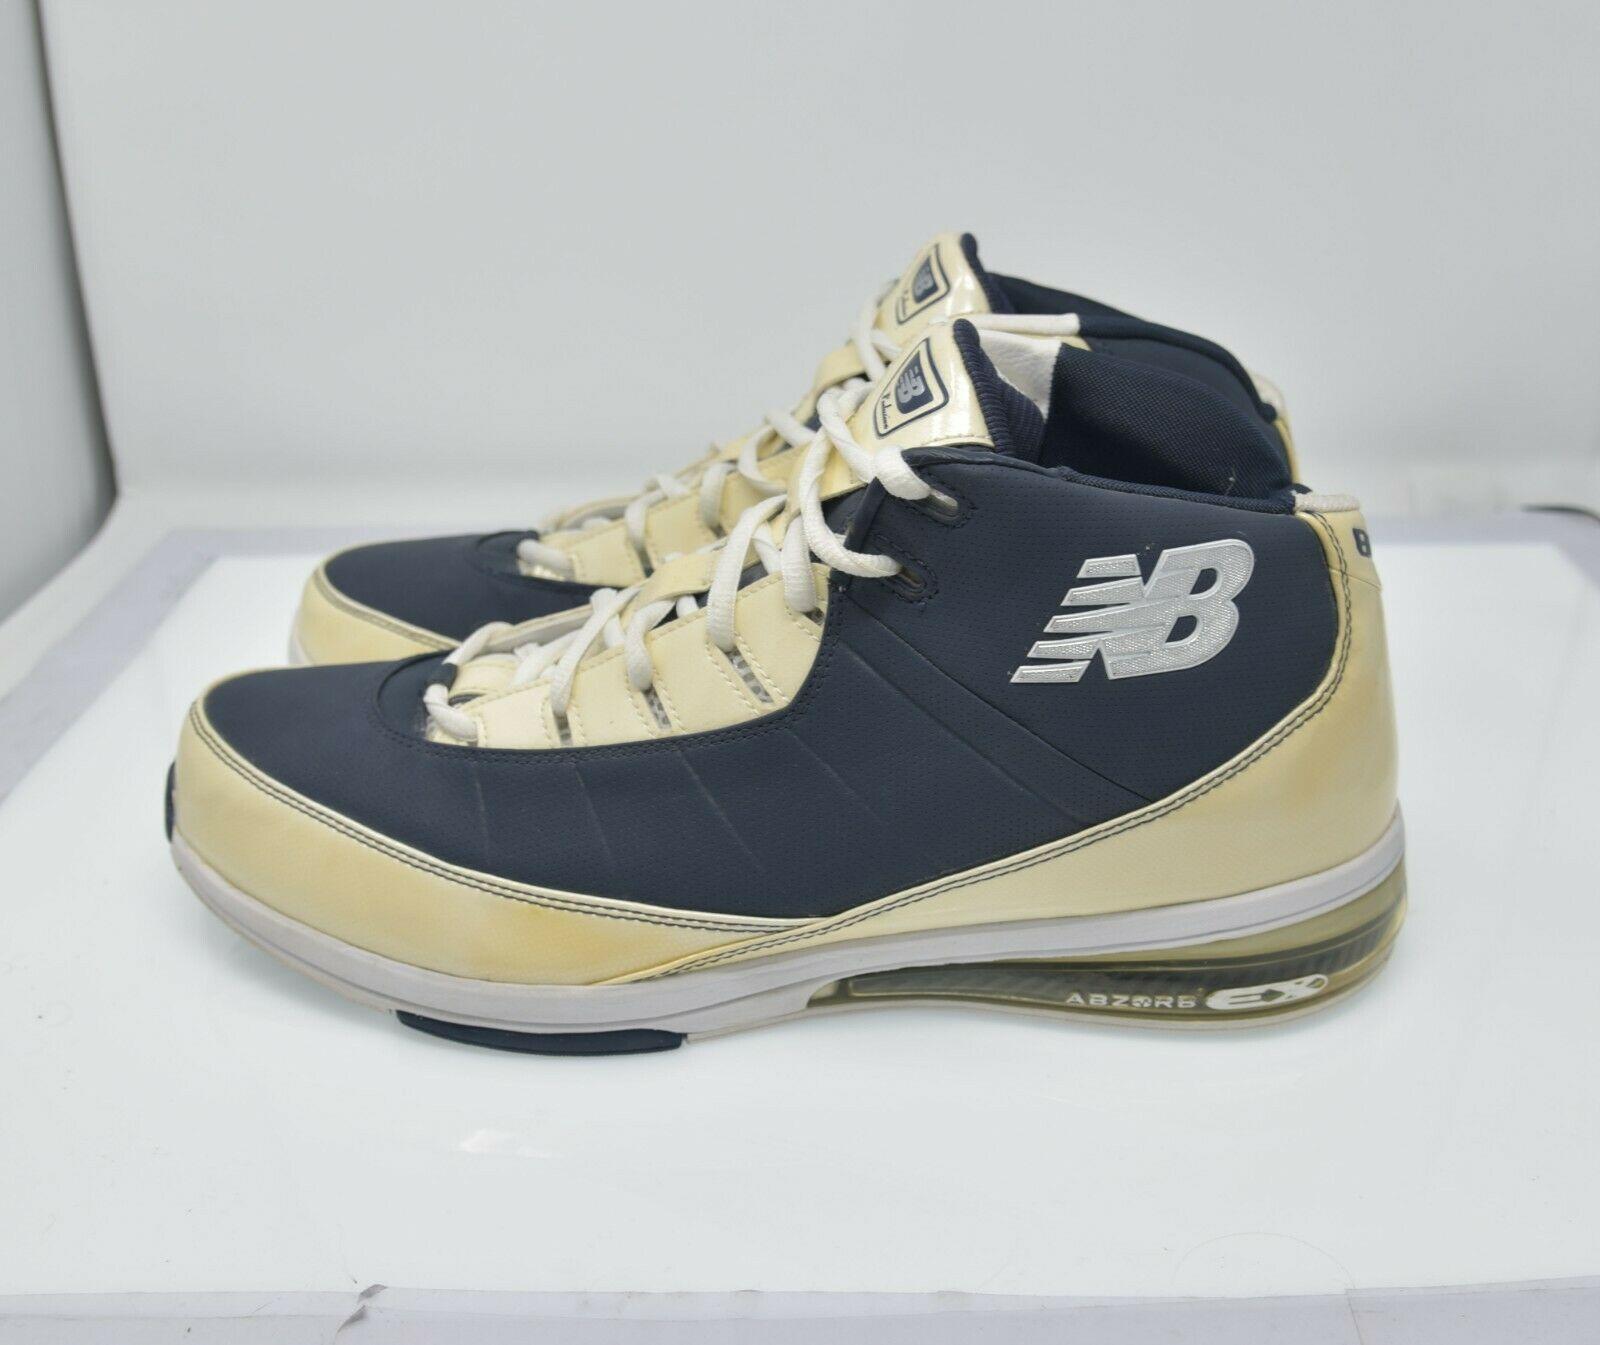 New Balance Exclusive Men's Sz 16 EU 51 High Top Sports Basketball Shoes